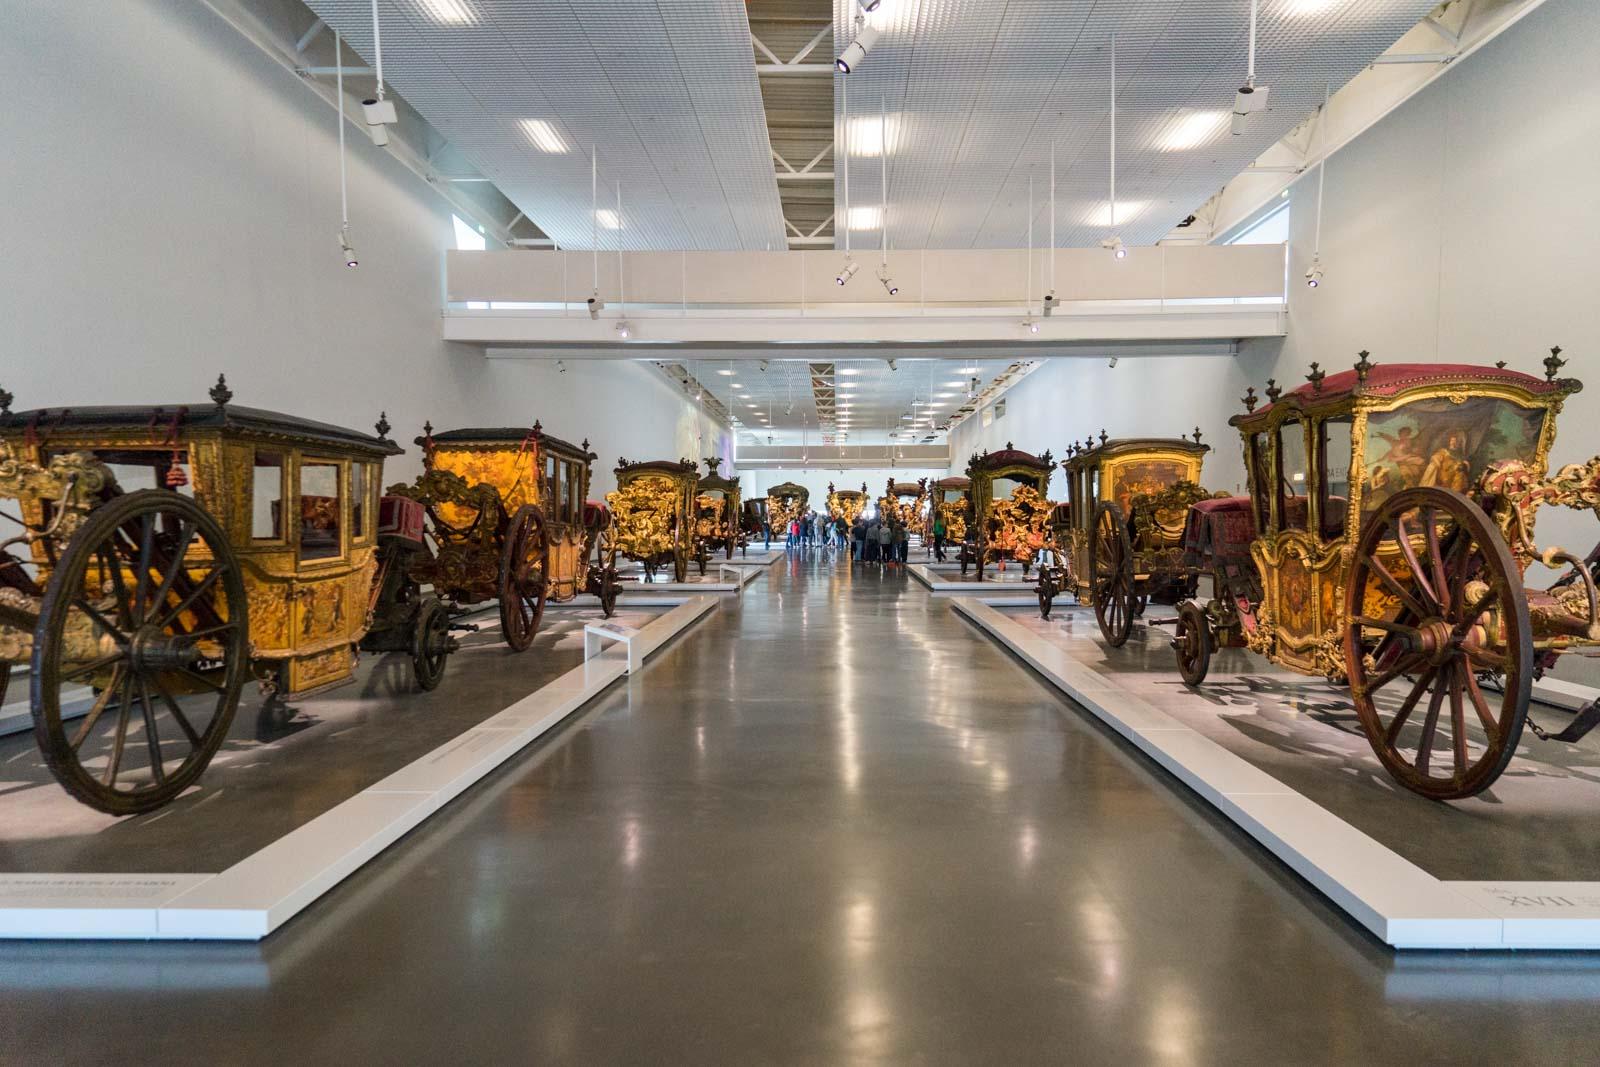 National Museum of Coaches, Belem, Lisbon, Portugal